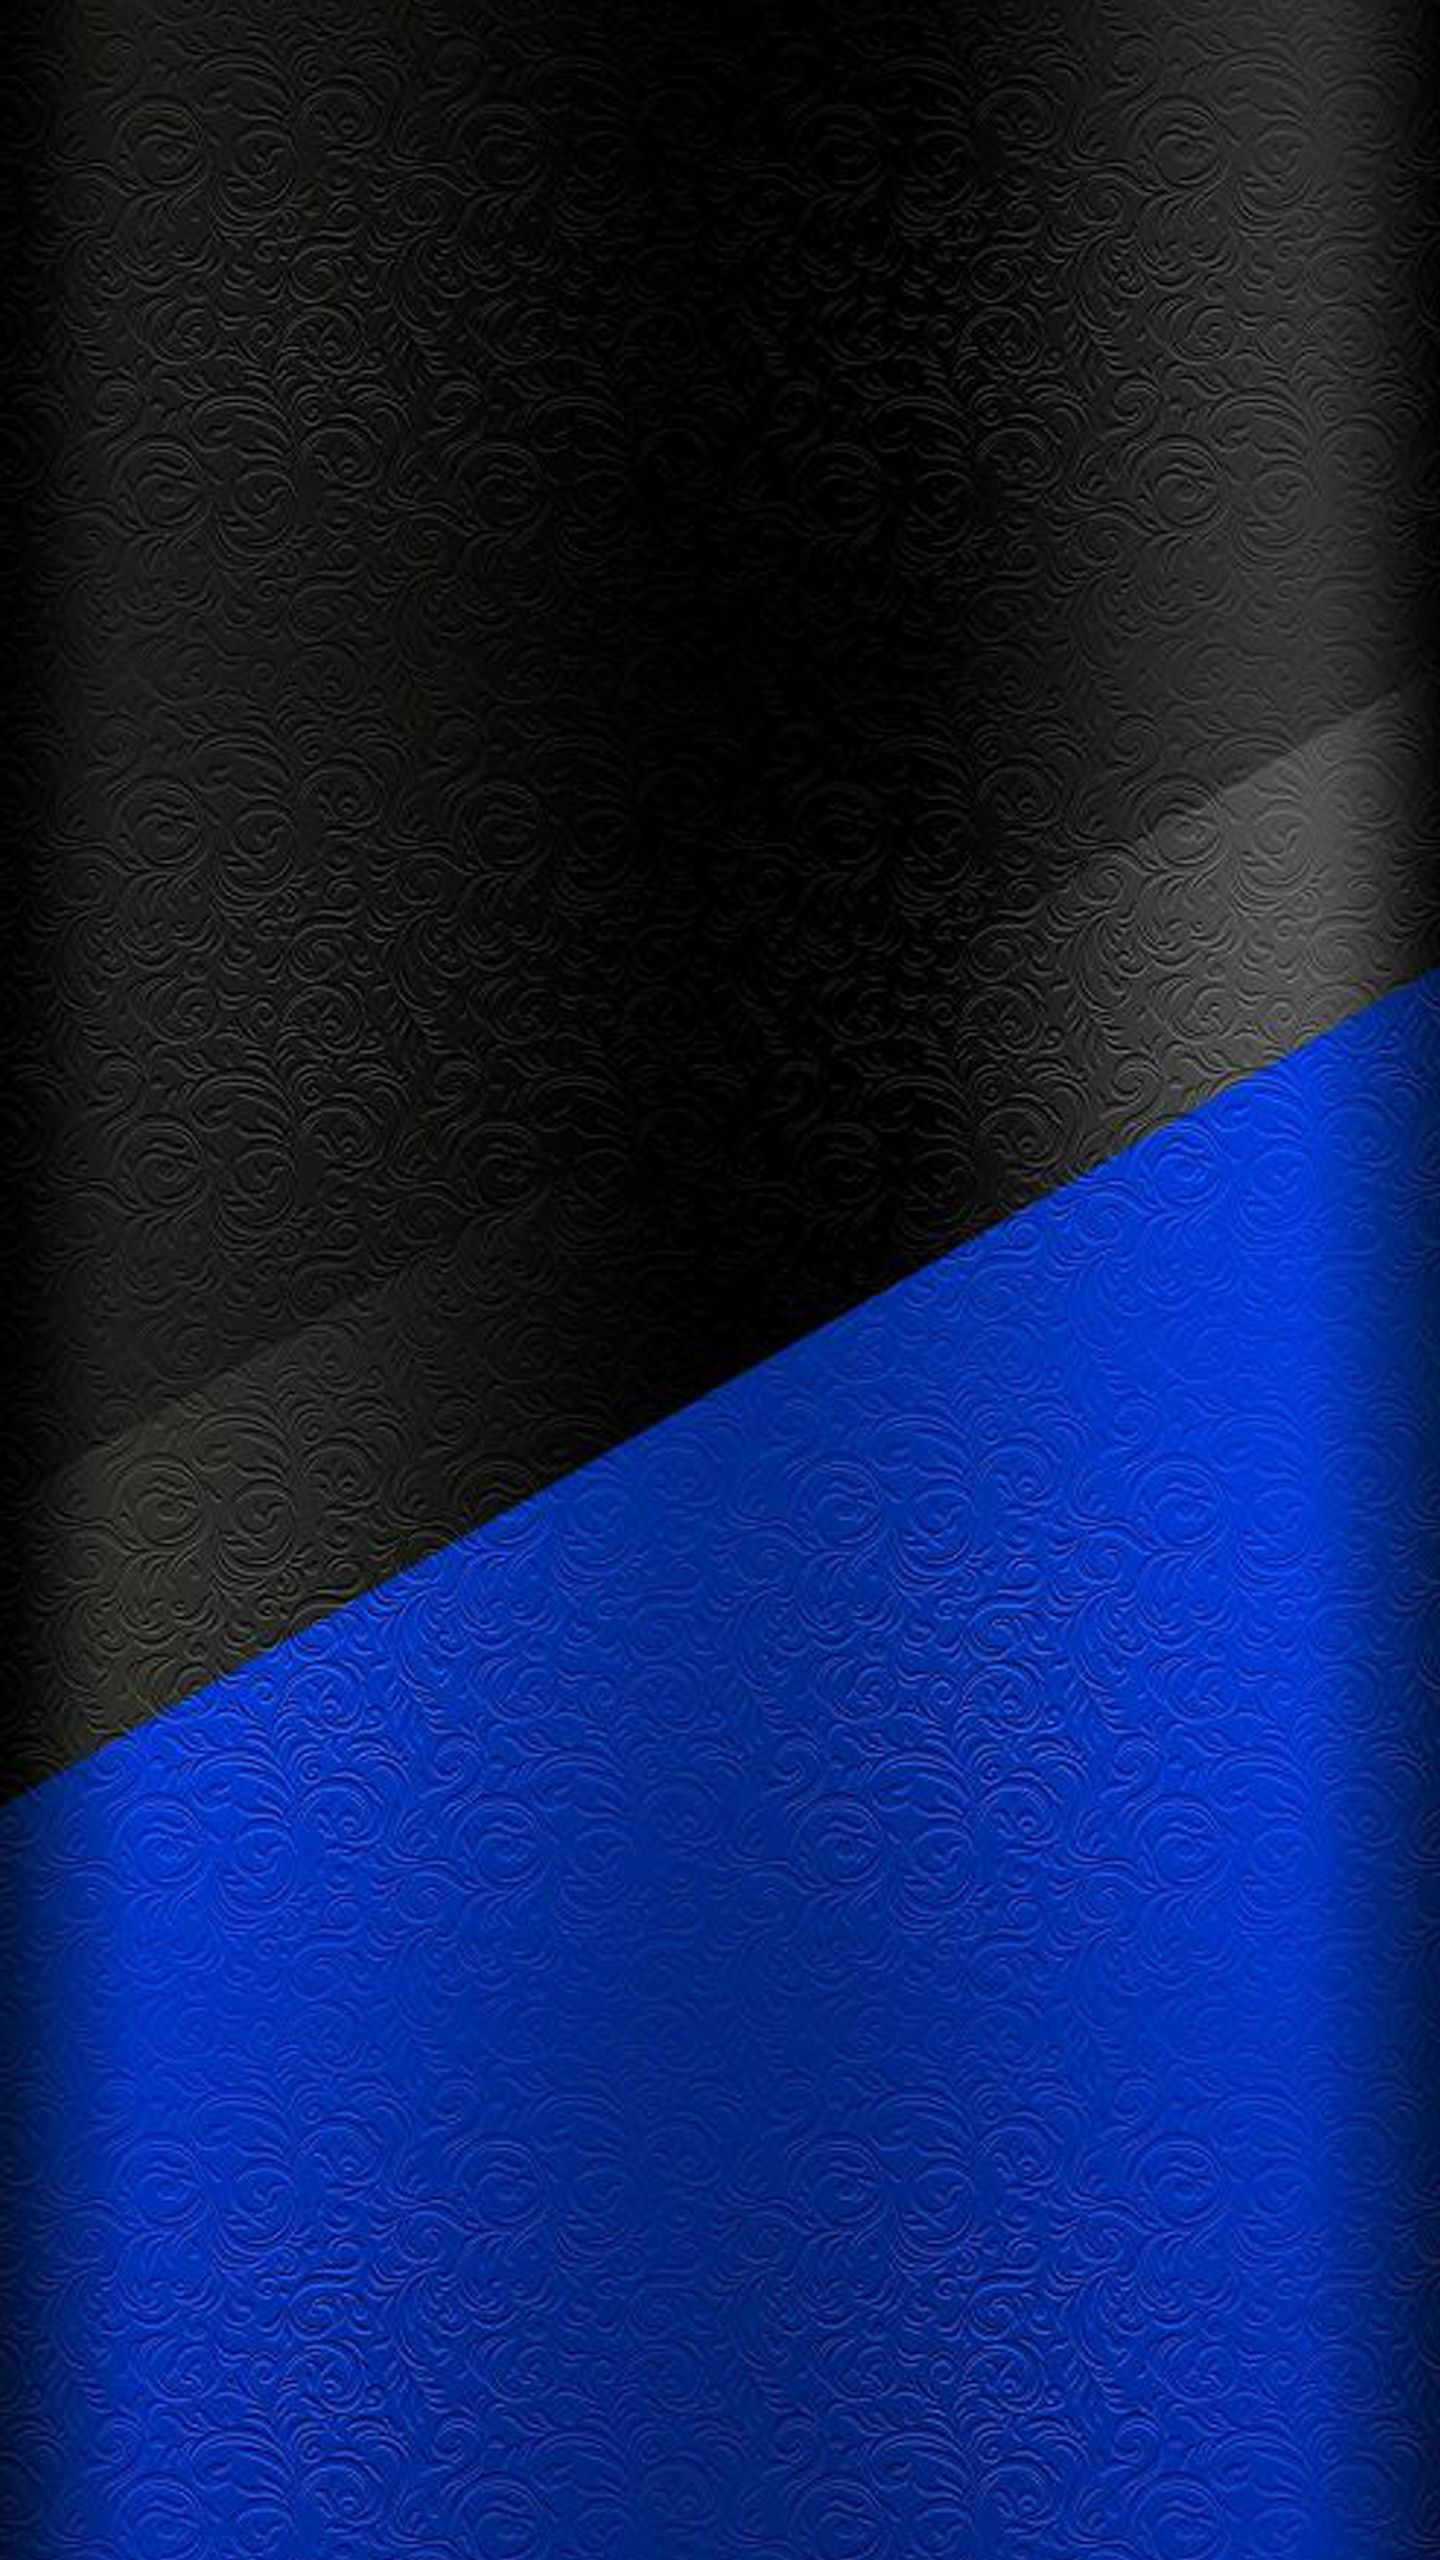 Dark S7 Edge Wallpaper 01 Black And Blue Floral Pattern